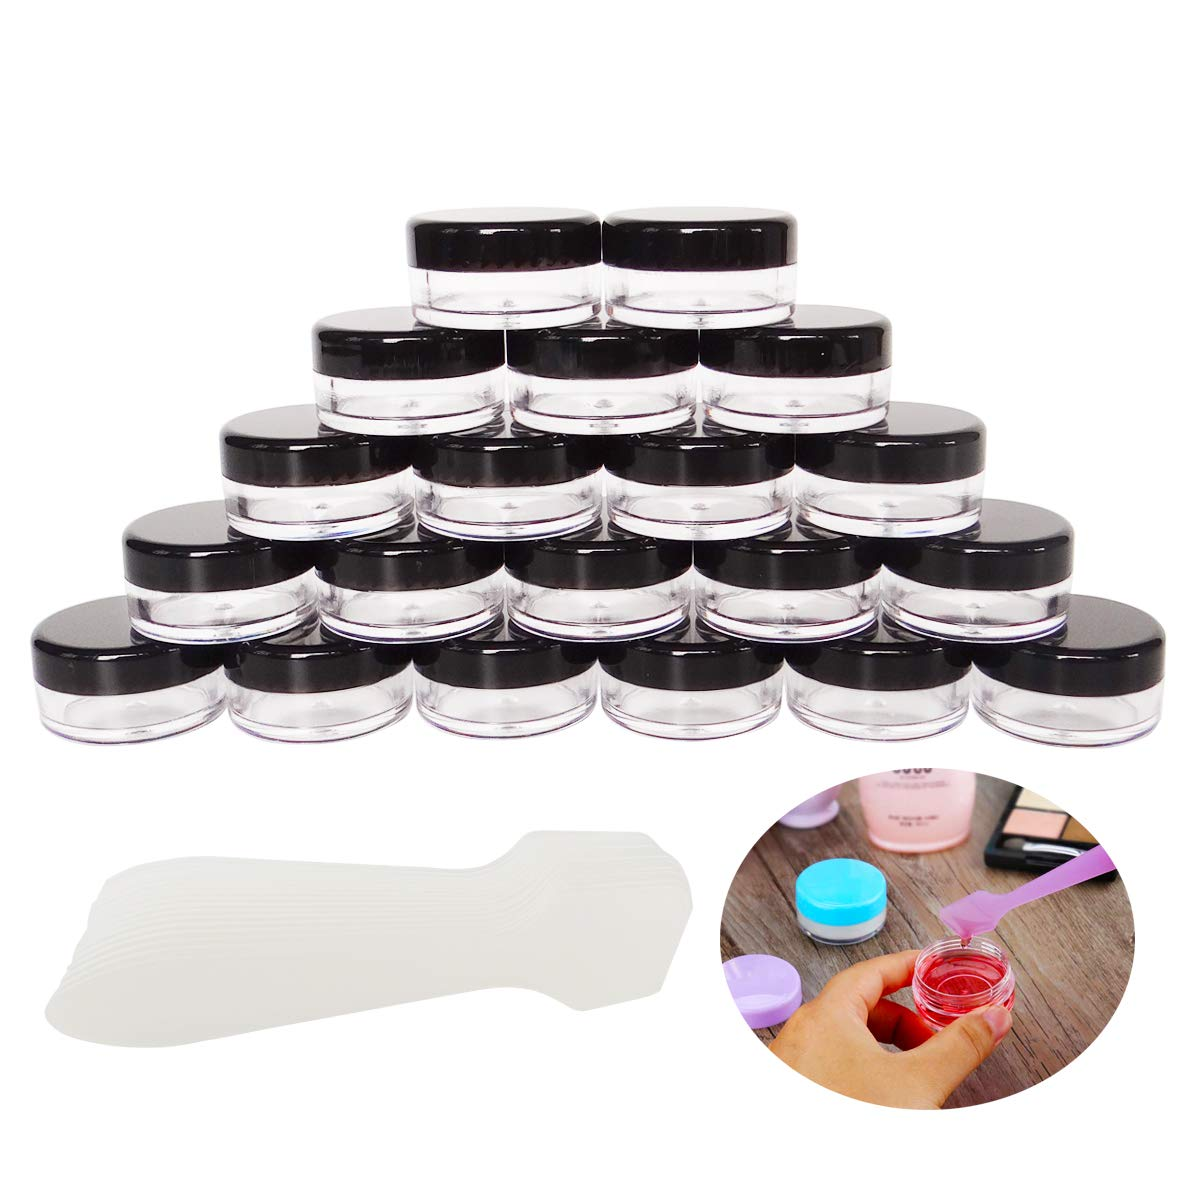 GreatforU online shop 20 Pack 5g Makeup Ranking TOP9 Sample Small Jars Cosmeti Empty 5ml